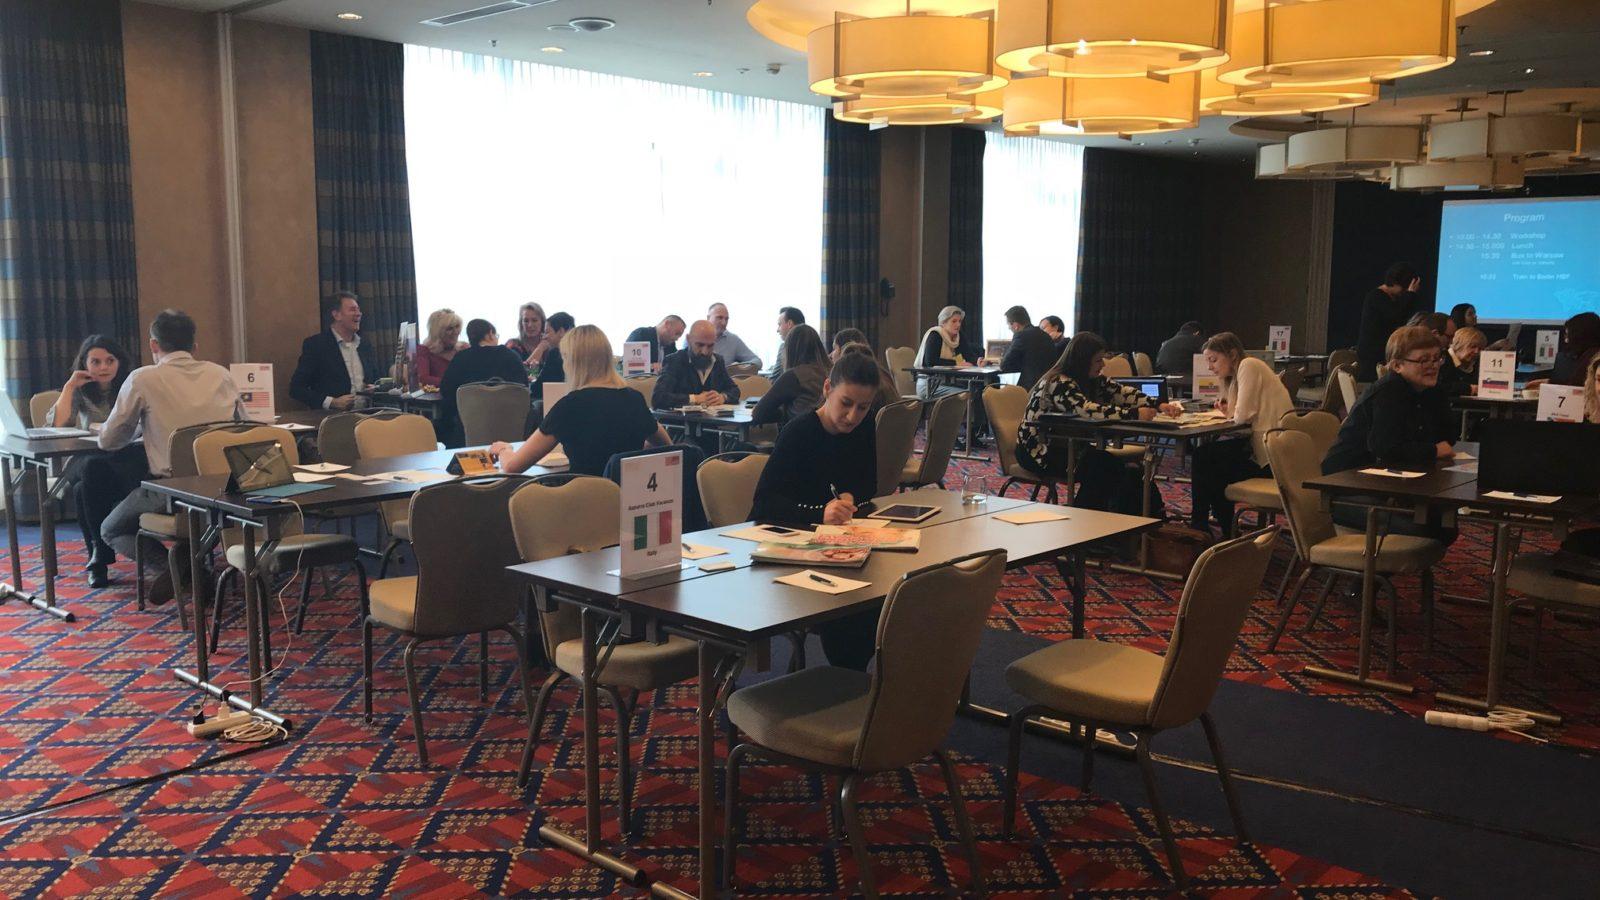 Workshop OUTgoingPOLAND 2018 za nami